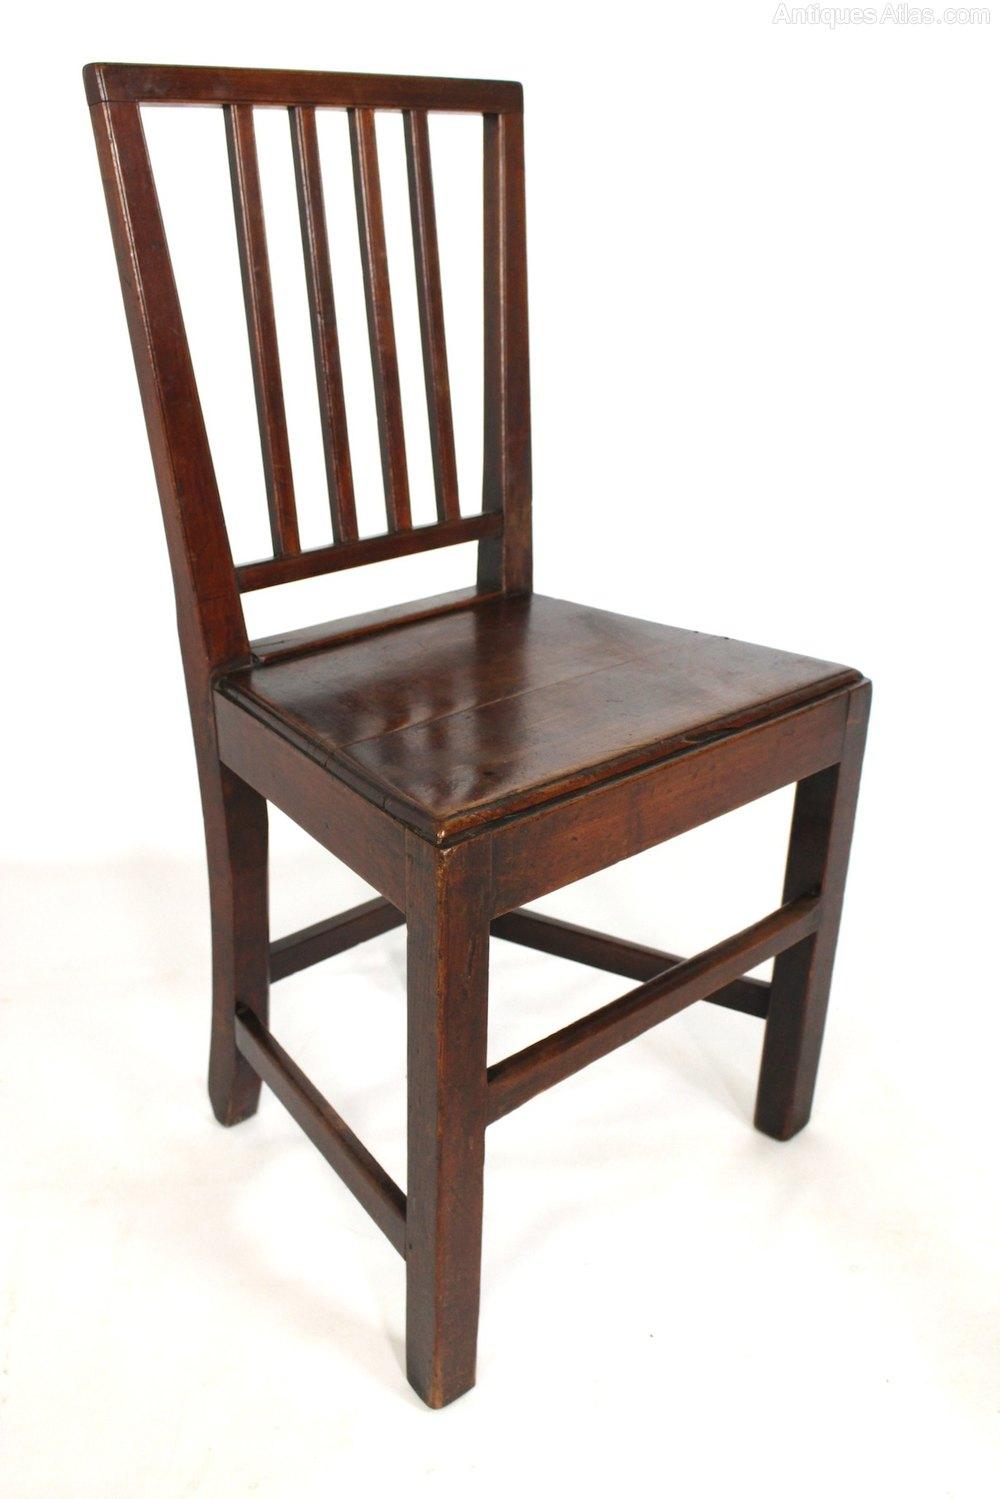 Pair Of 18c Rustic Kitchen Farmhouse Chairs Antiques Atlas